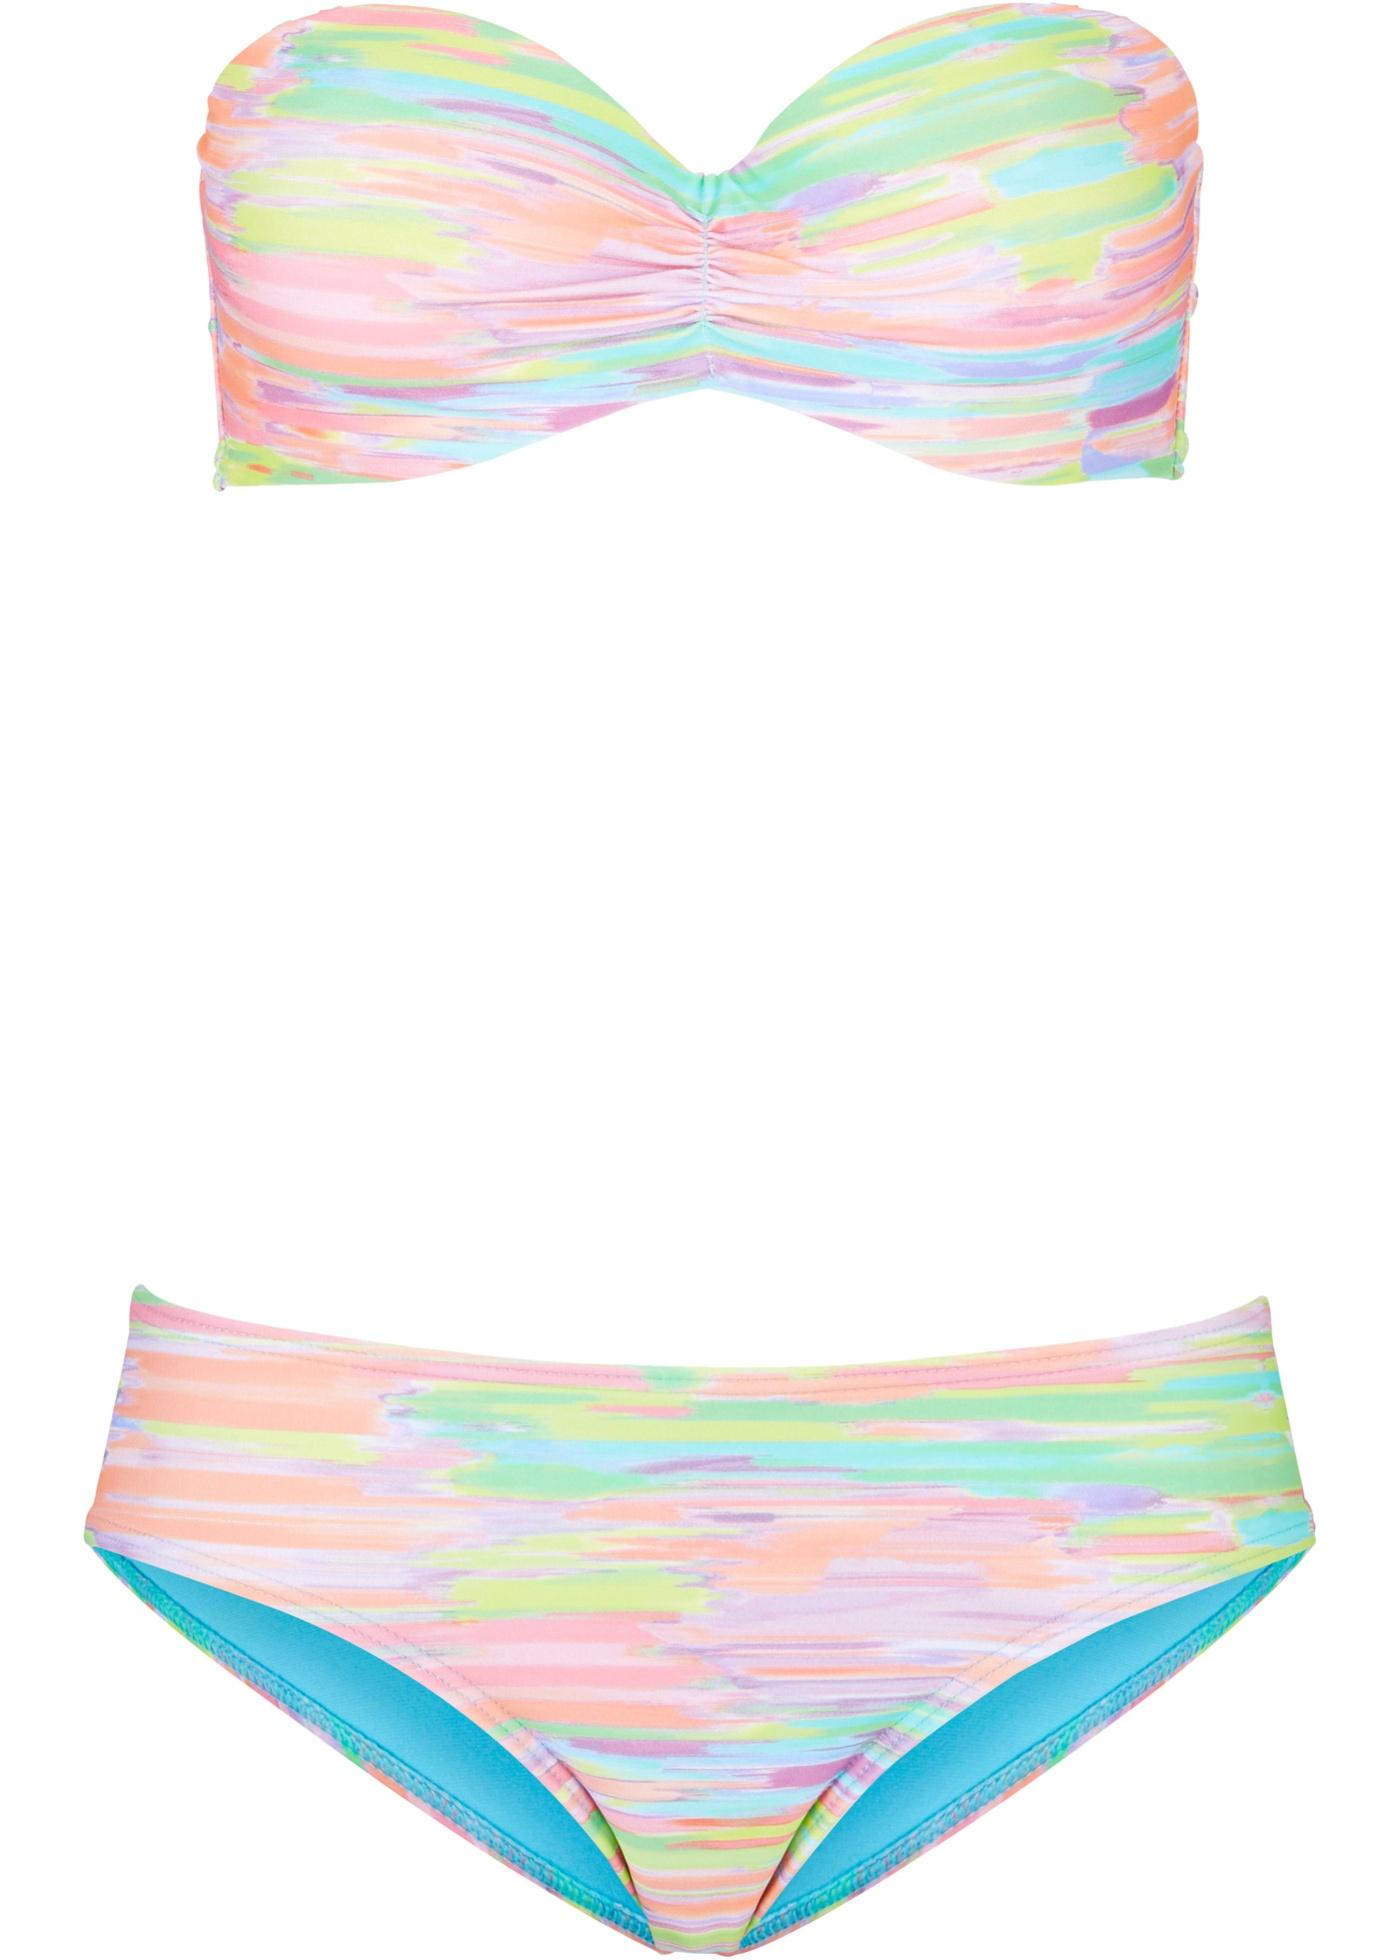 Bademode - Balconette Bügel Bikini (2 tlg. Set) › bonprix › grün  - Onlineshop Bonprix